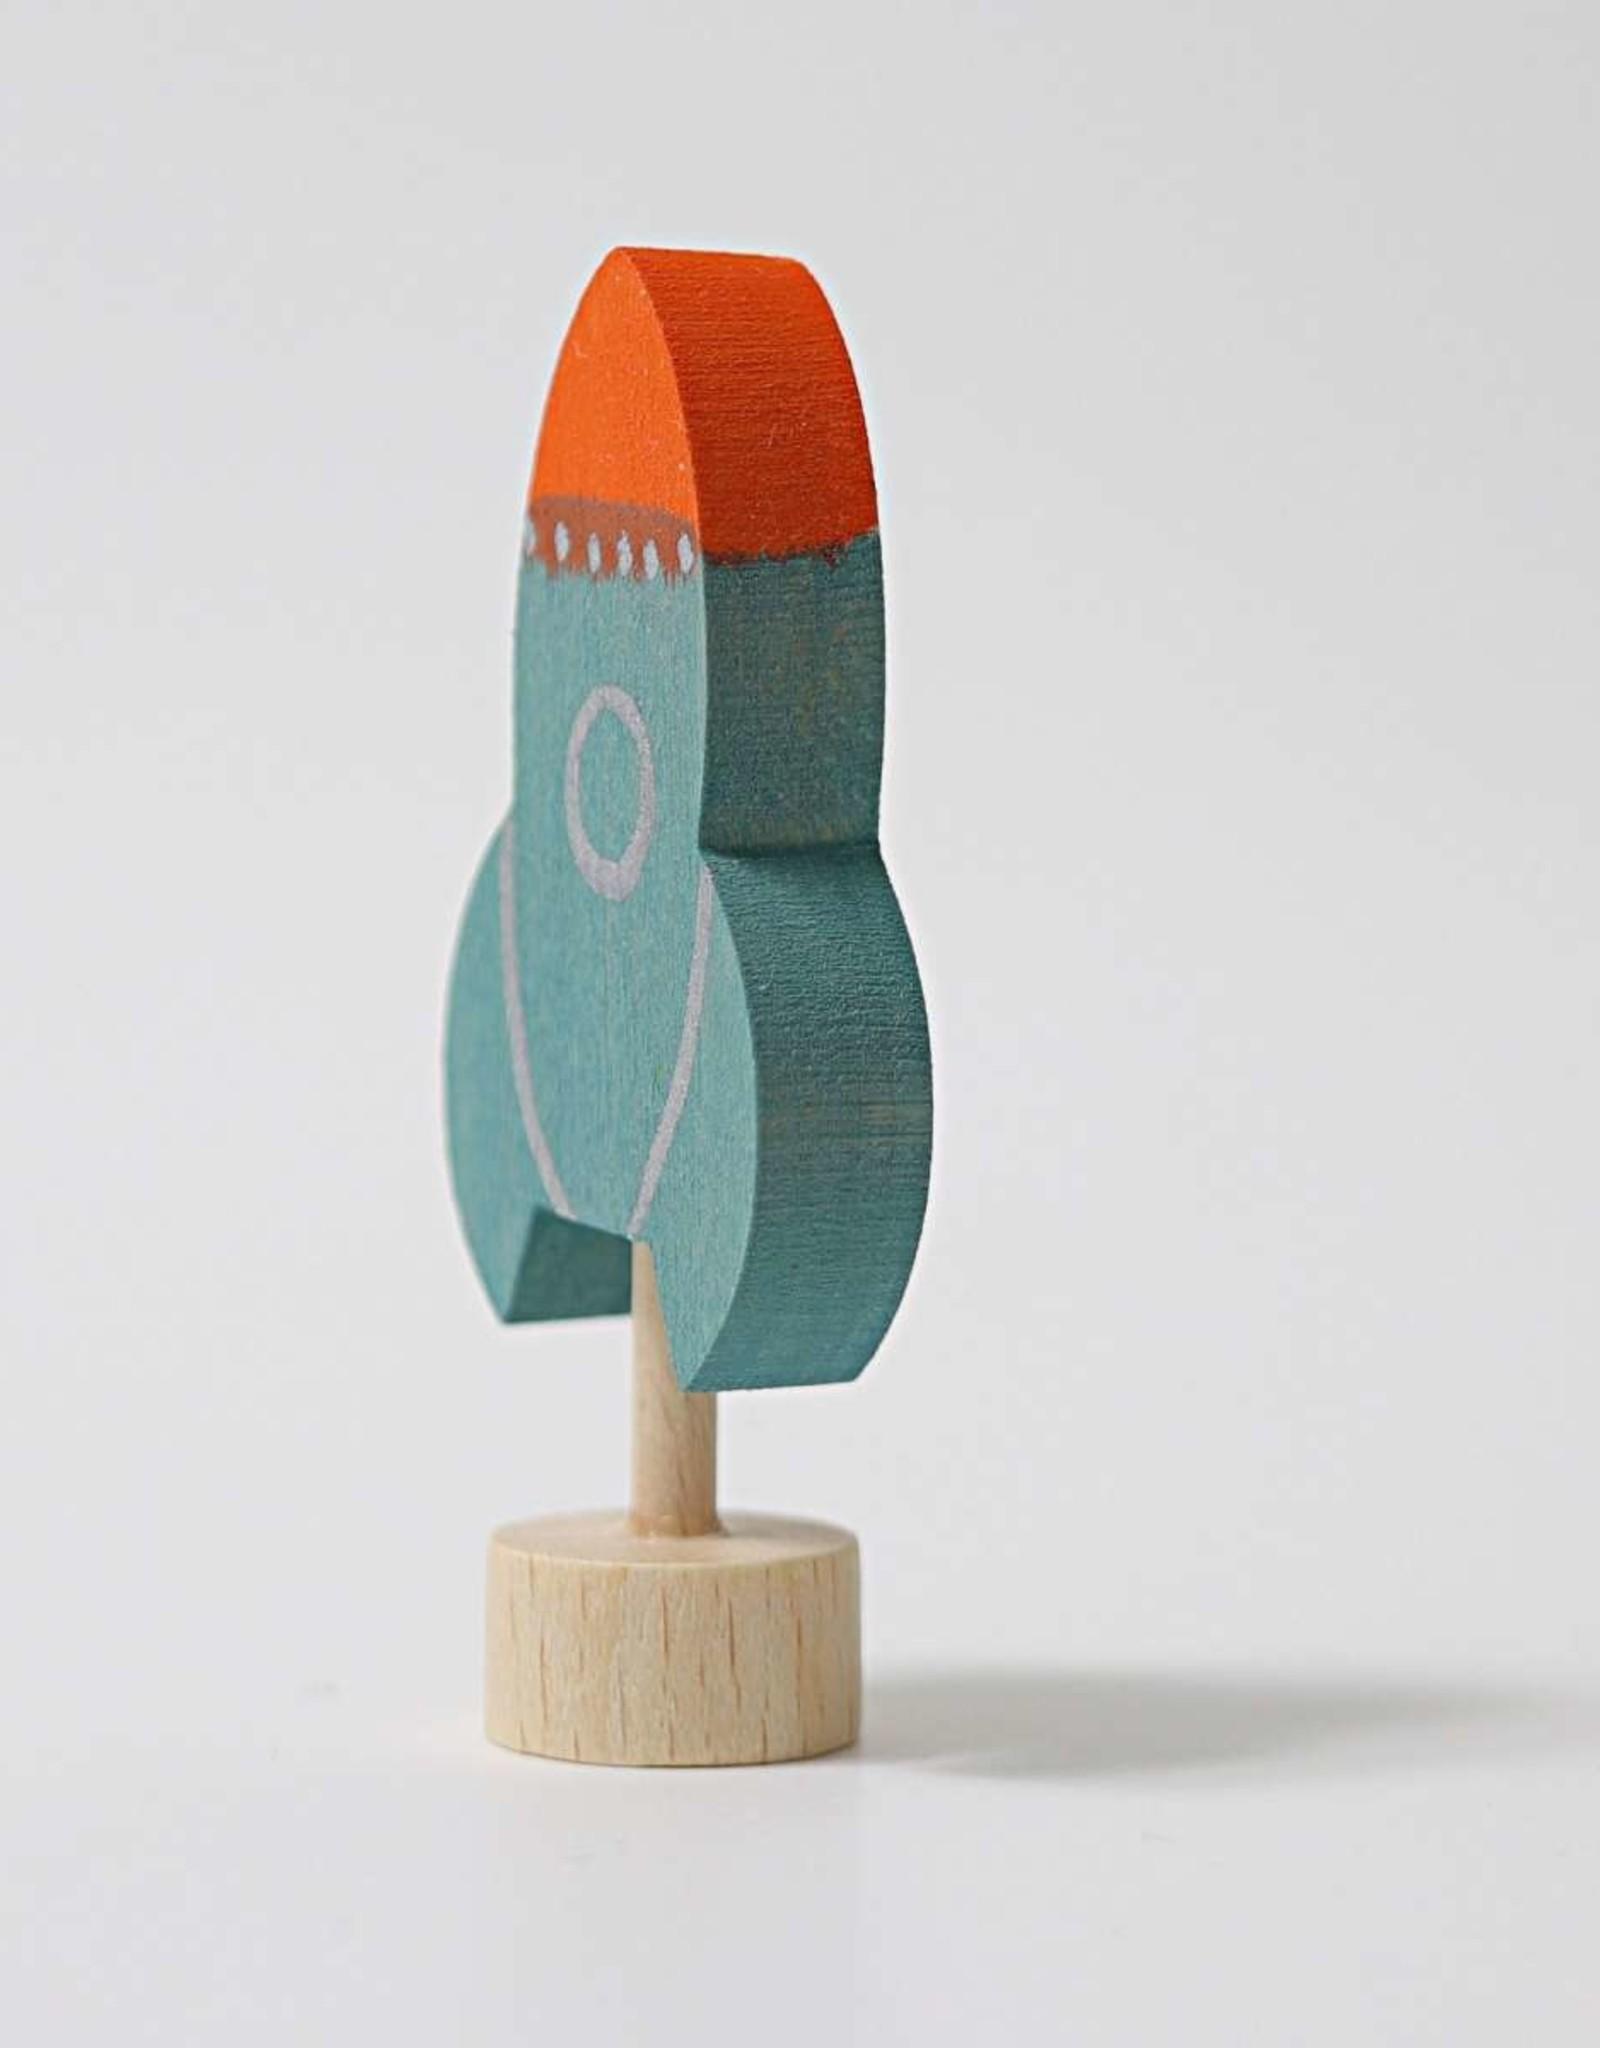 Grimm's Decorative Figure Rocket